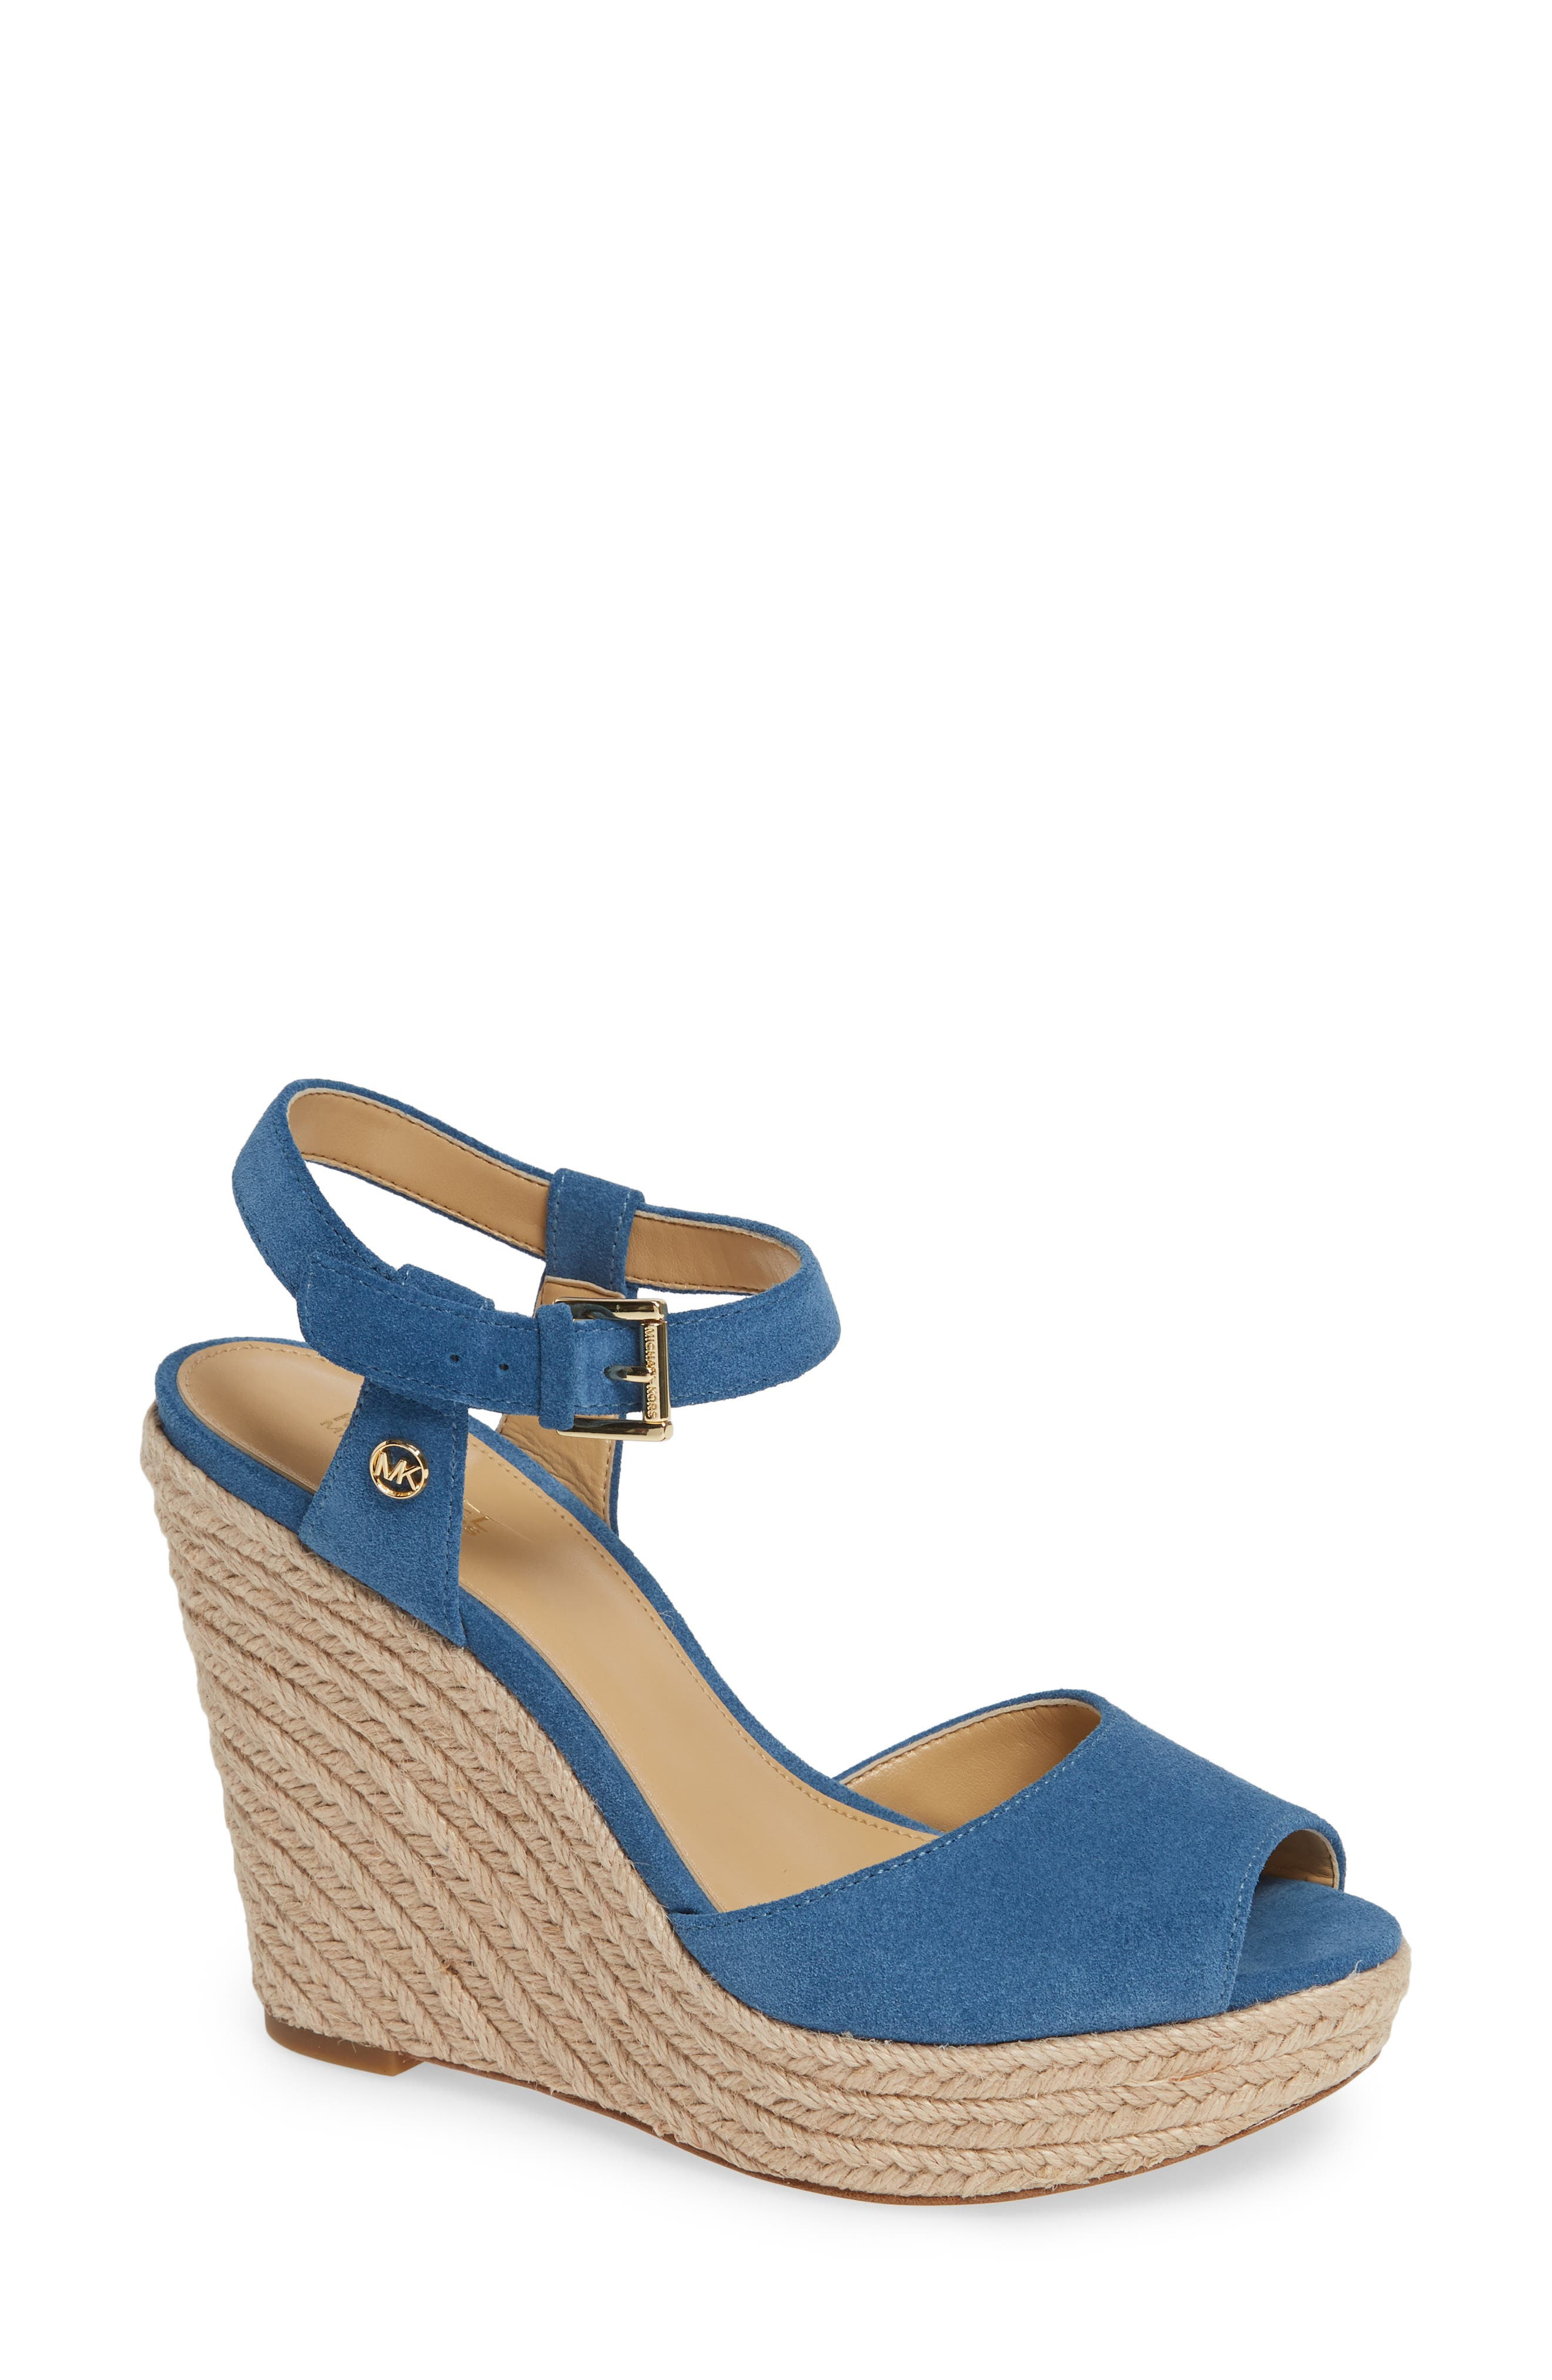 Michael Michael Kors Carlyn Espadrille Wedge Sandal, Blue